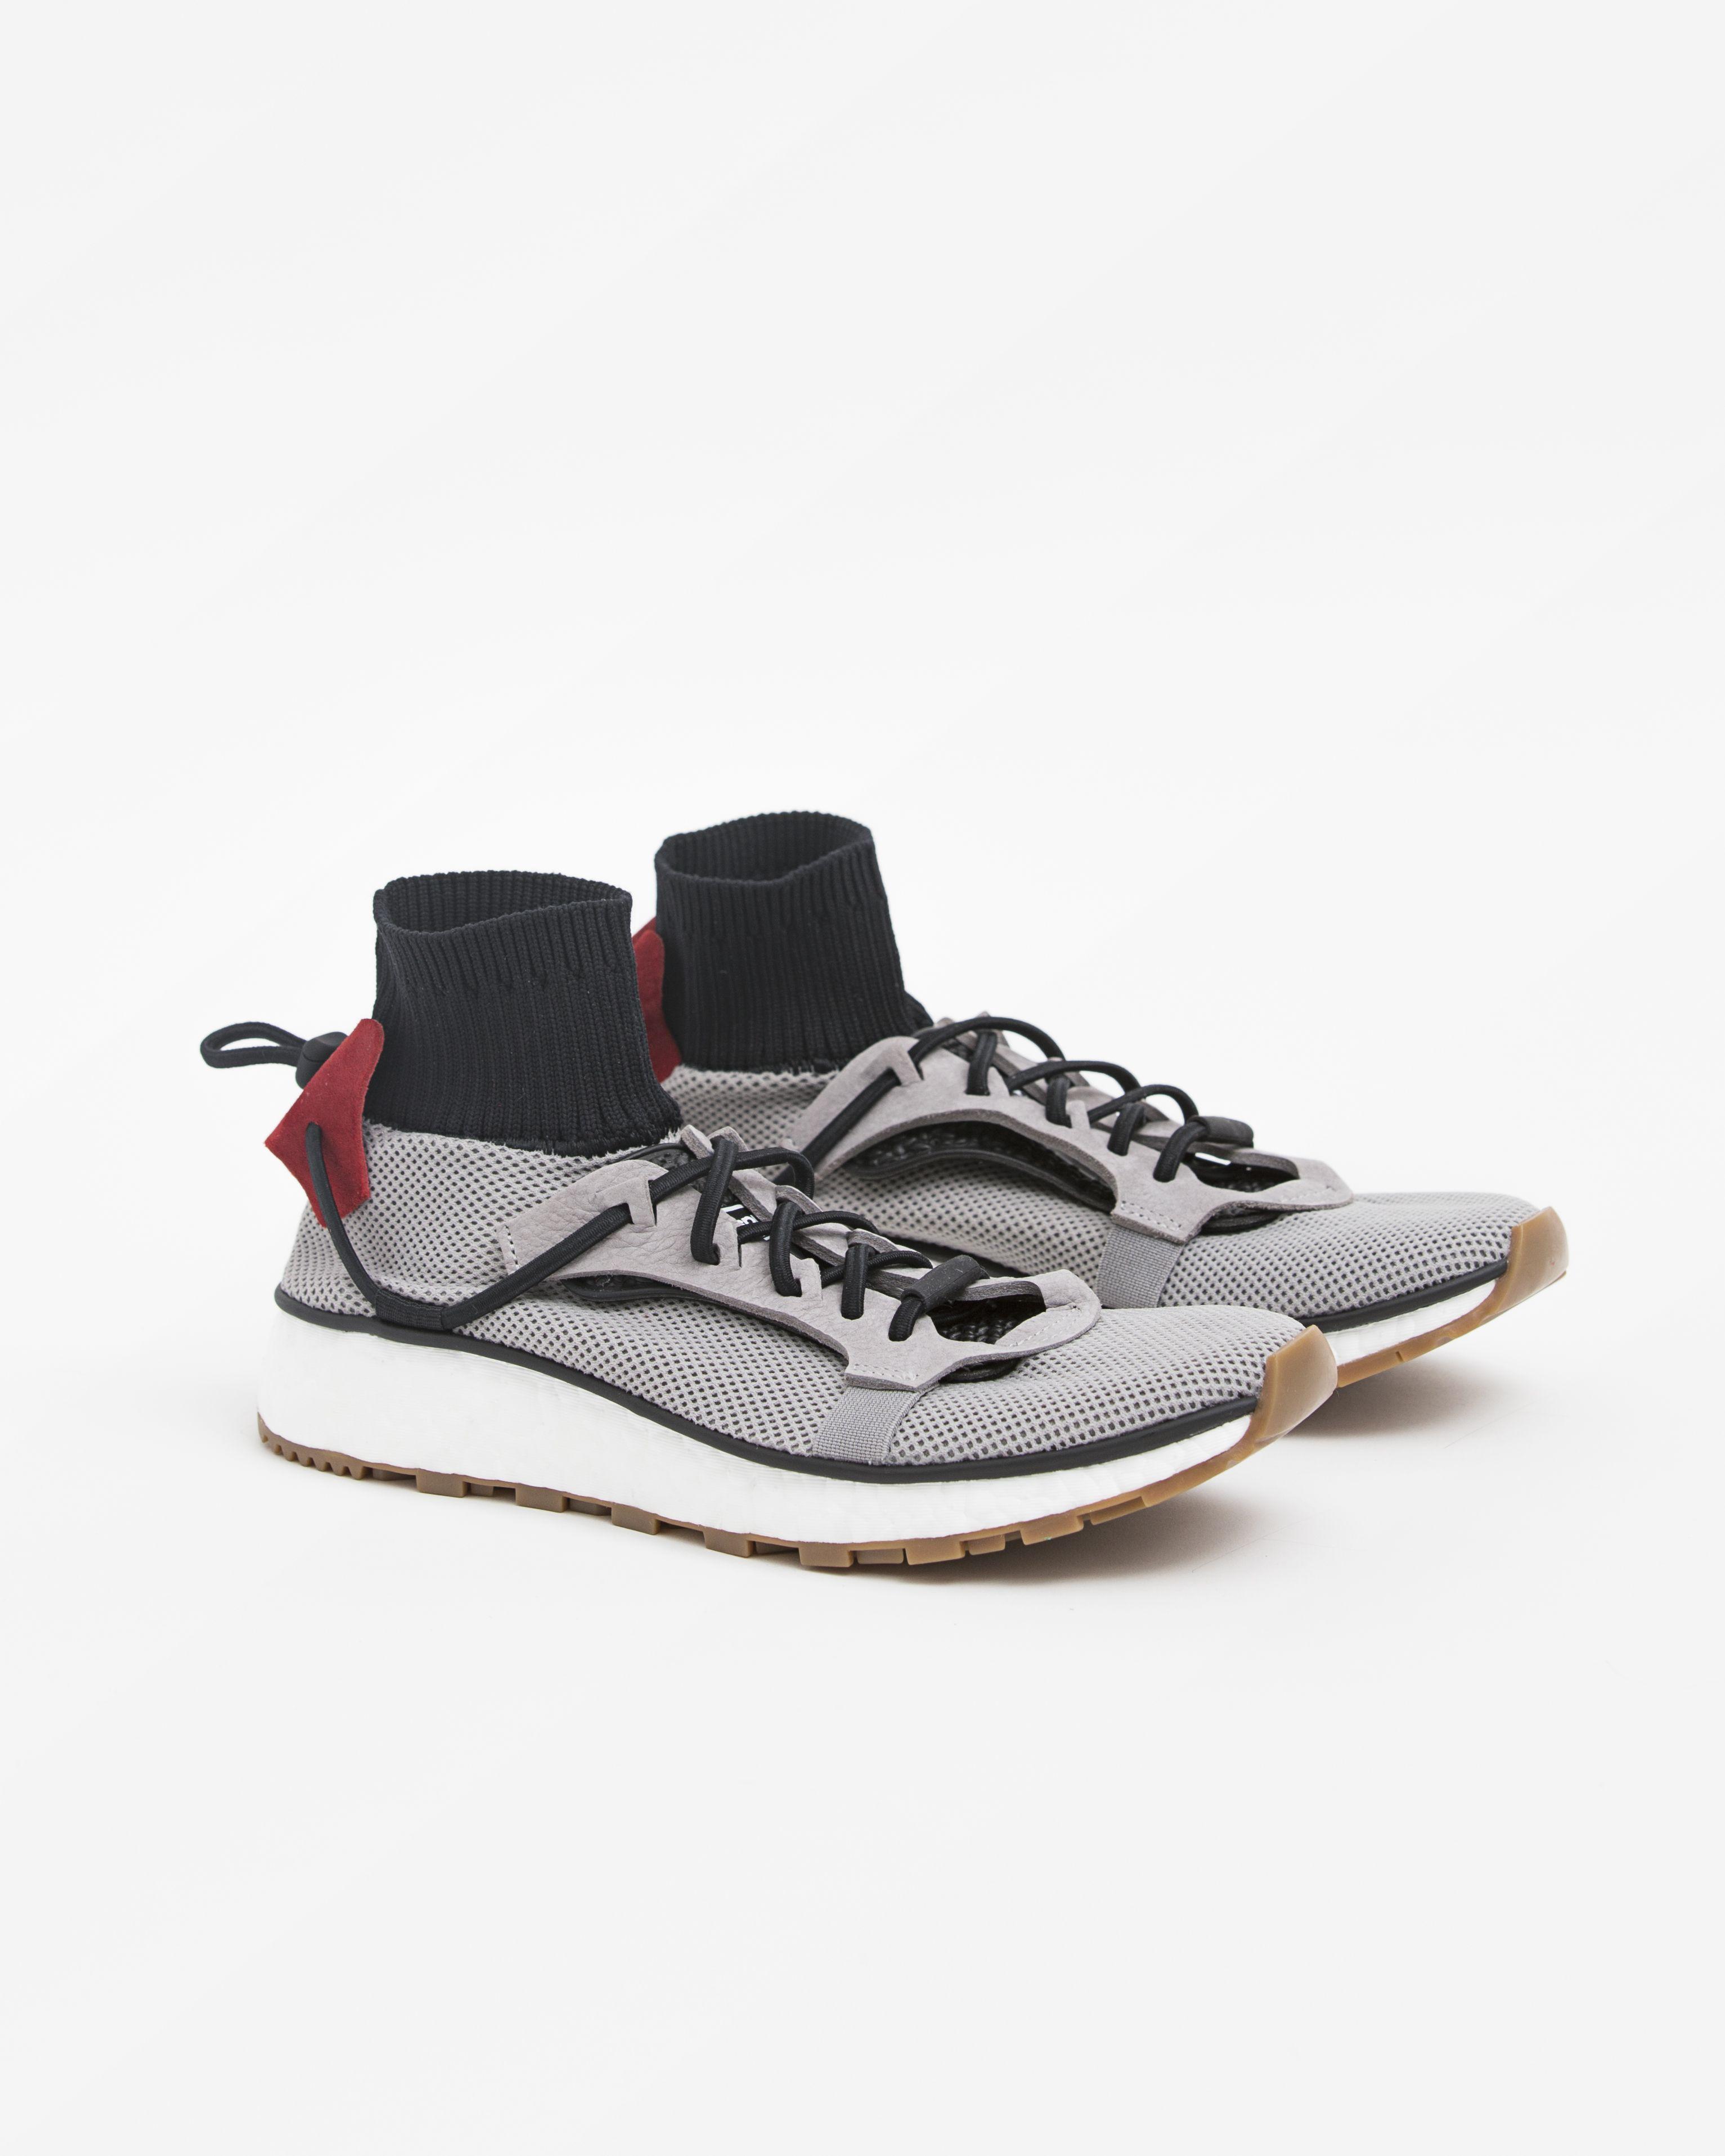 adidas originali x alexander wang correre grey adidas originali x